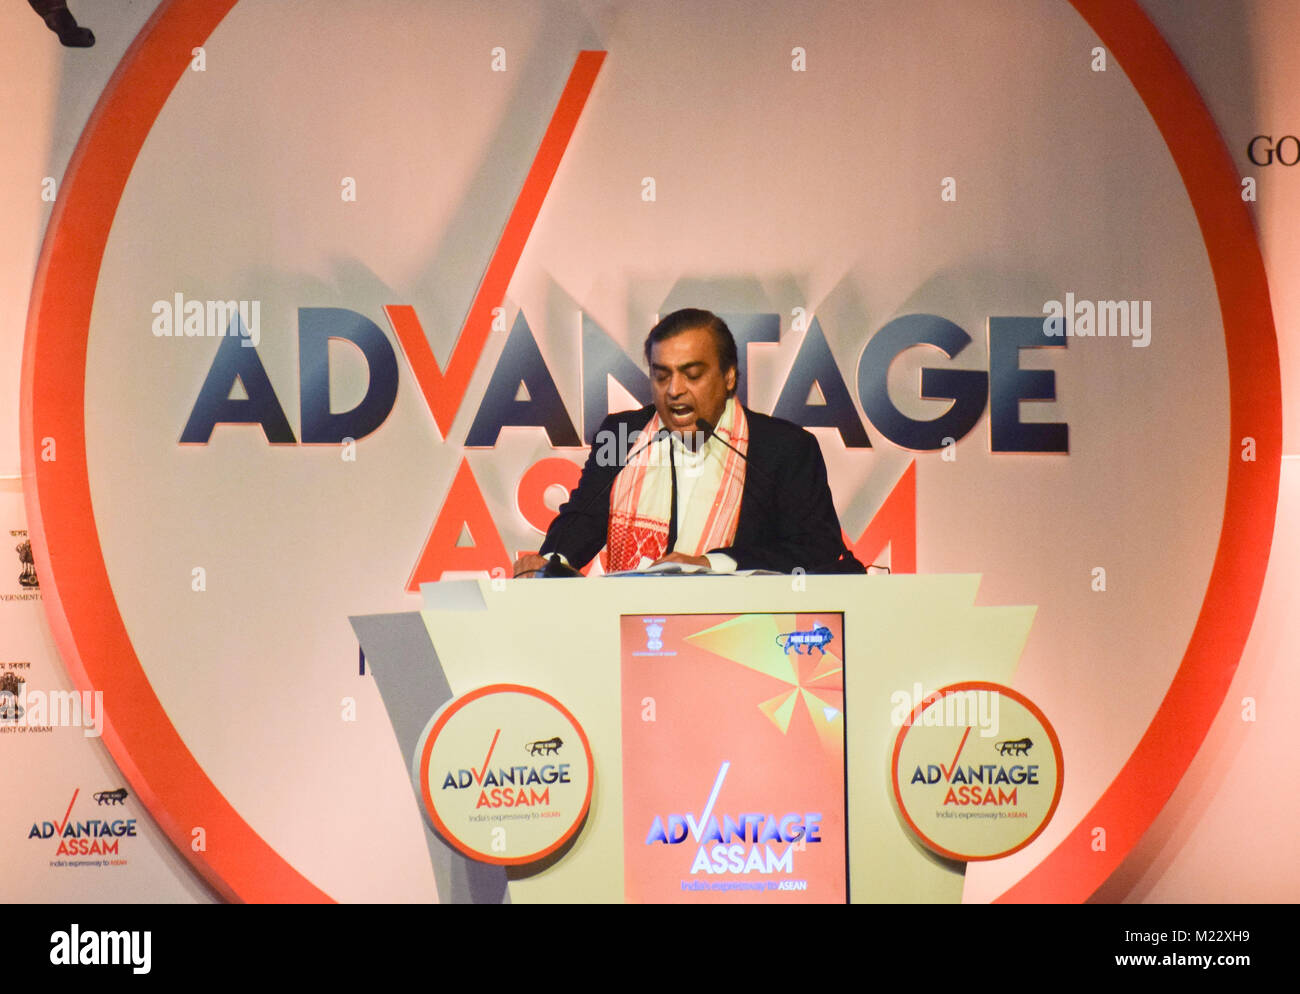 Guwahati, India. 03rd Feb, 2018. Industrialist Mukesh Ambani delivers a speech at the Advantage Assam- Global Investors - Stock Image